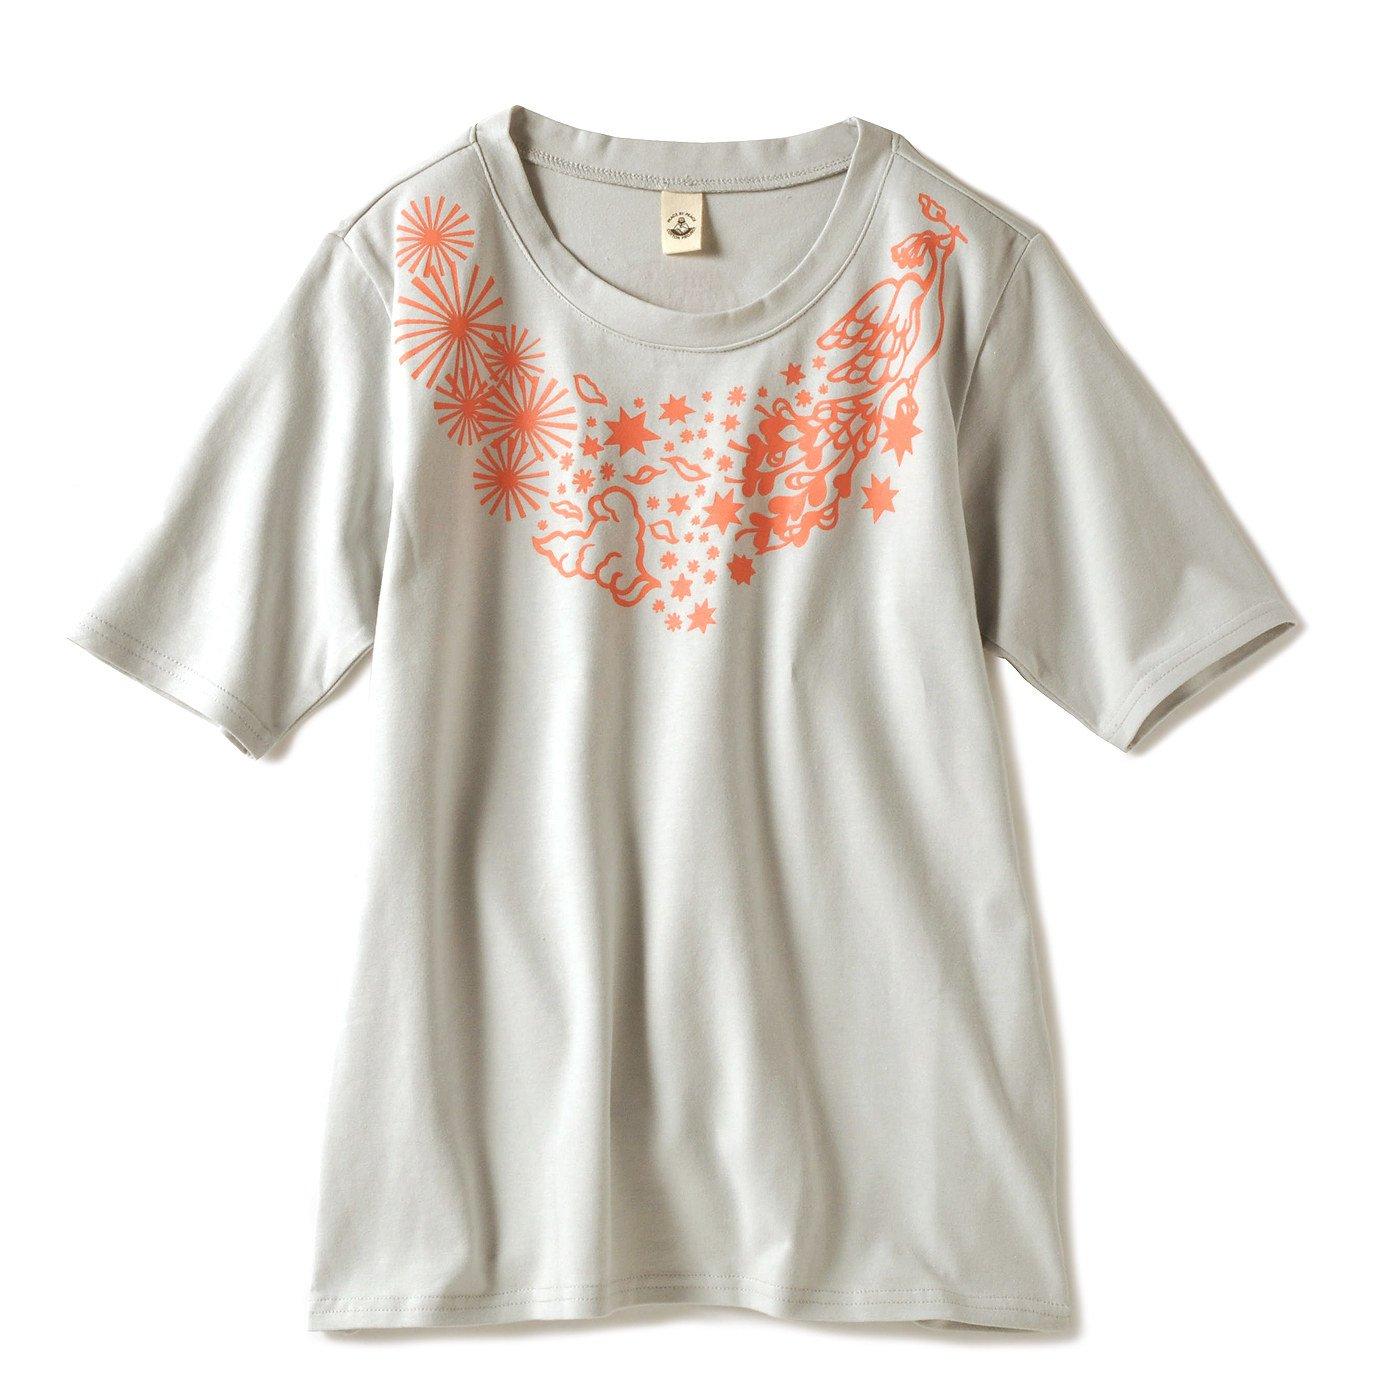 PEACE BY PEACE コットンプロジェクト のびやかヨガTシャツ〈情熱的な火〉